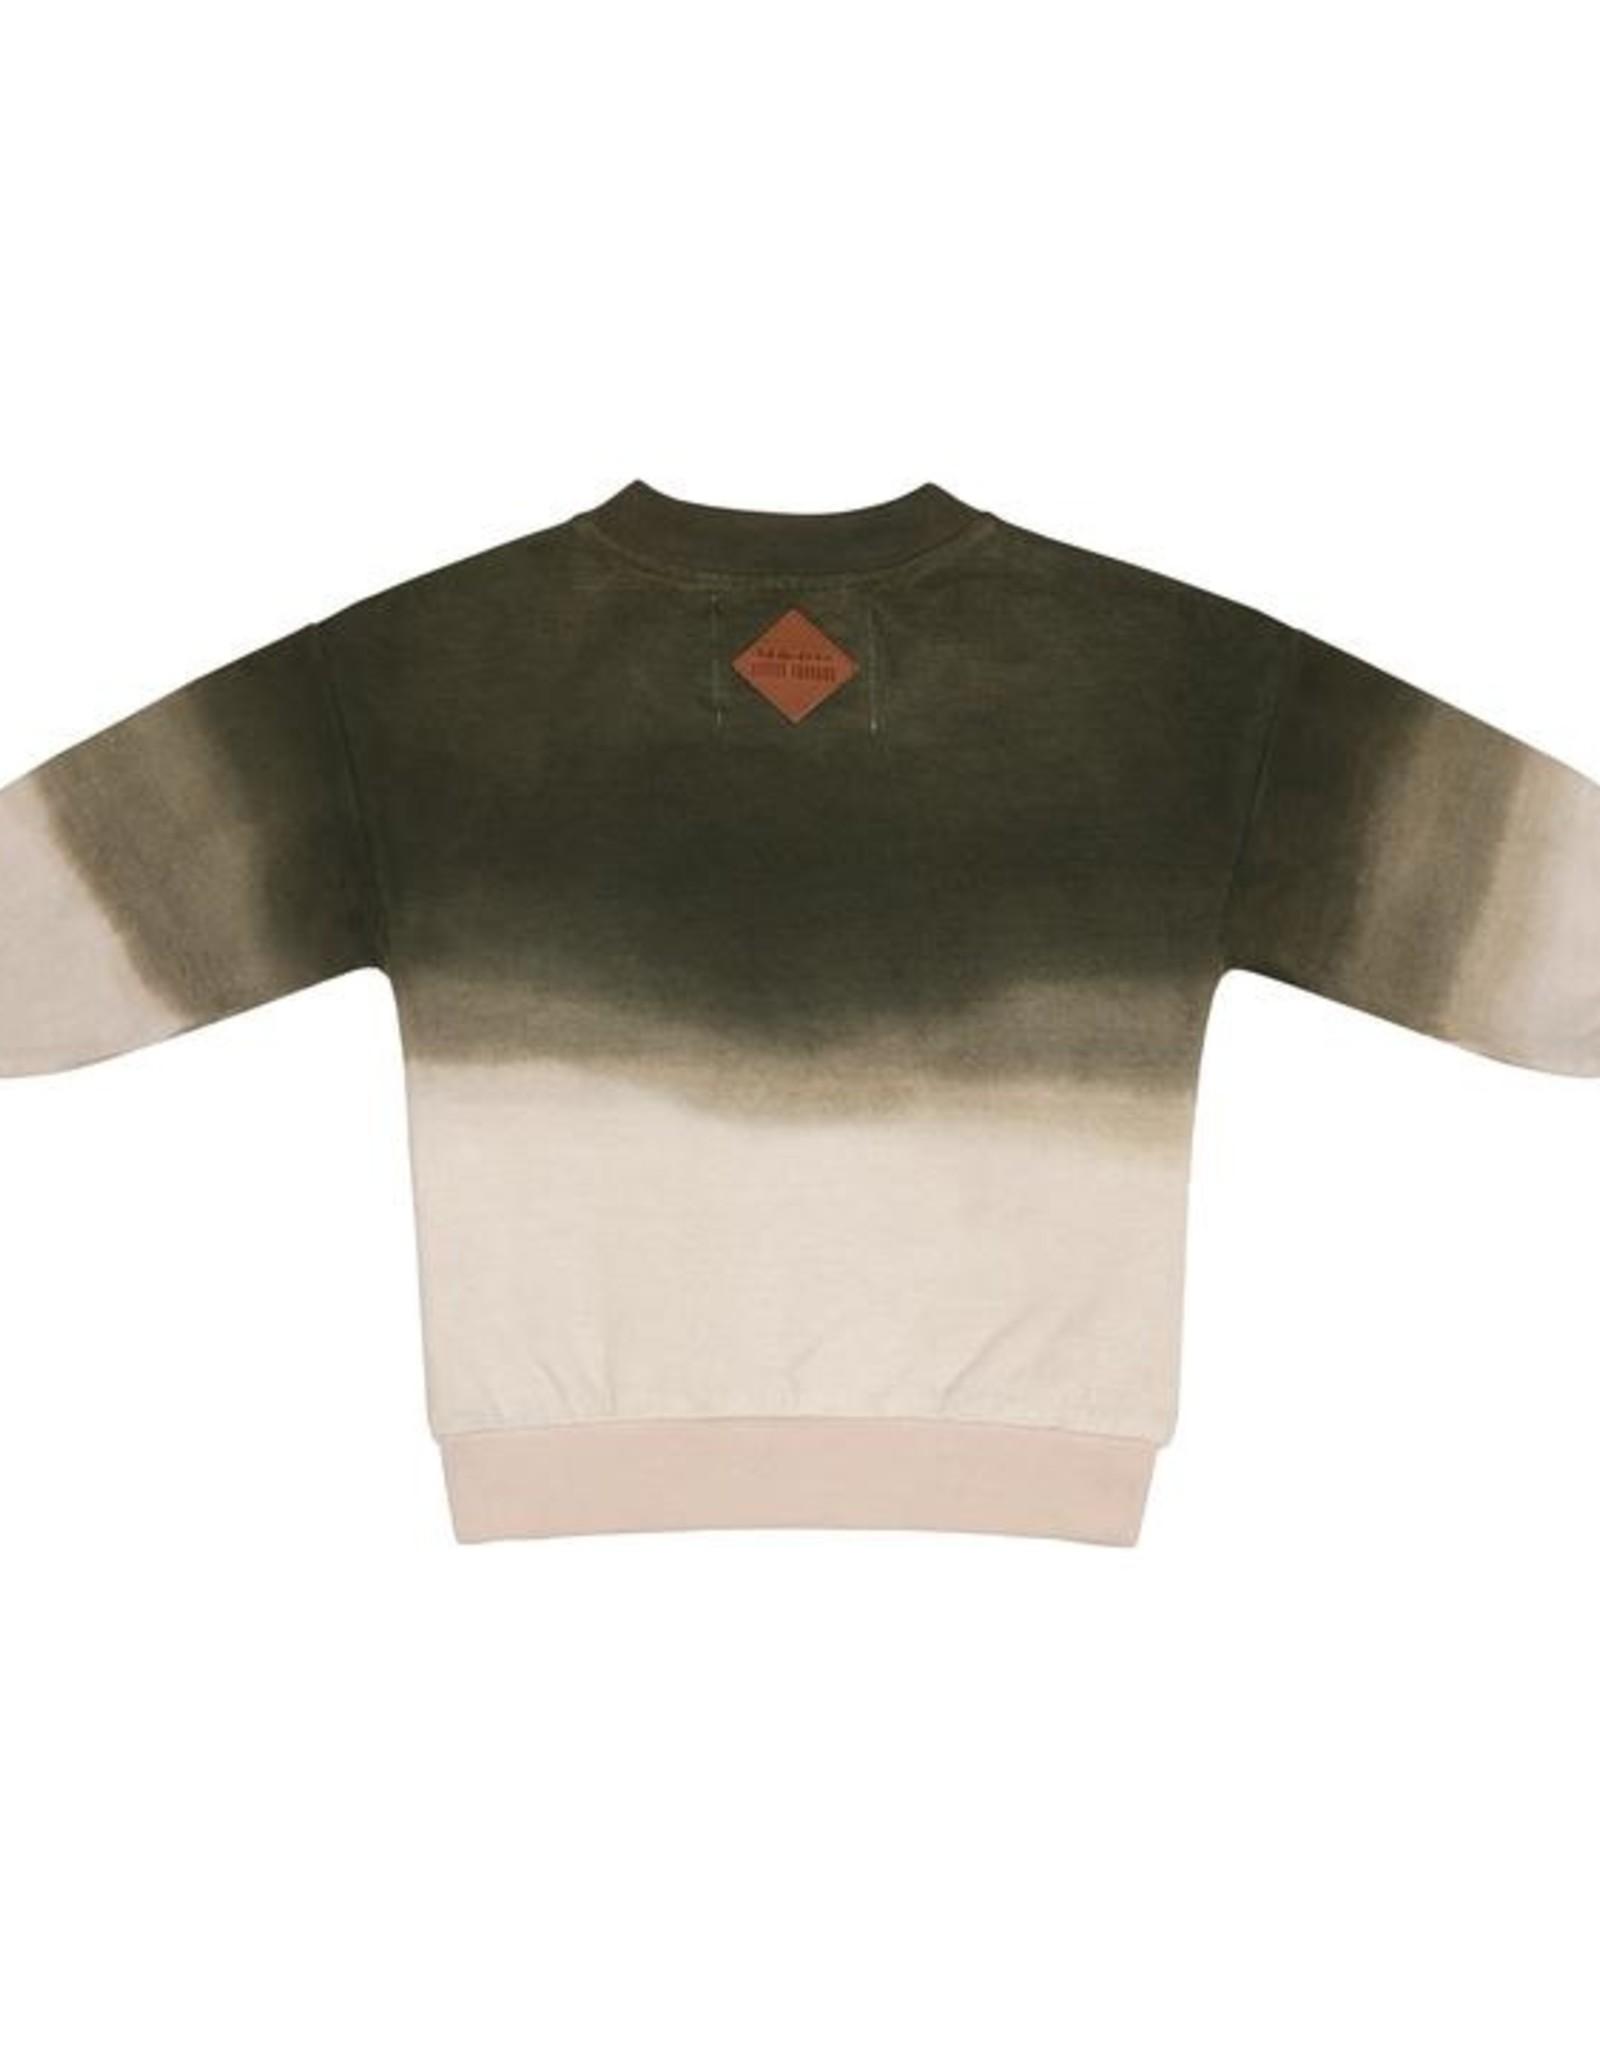 Little Indians Sweater - Degrading Dye Dark Green 0 - 3 m